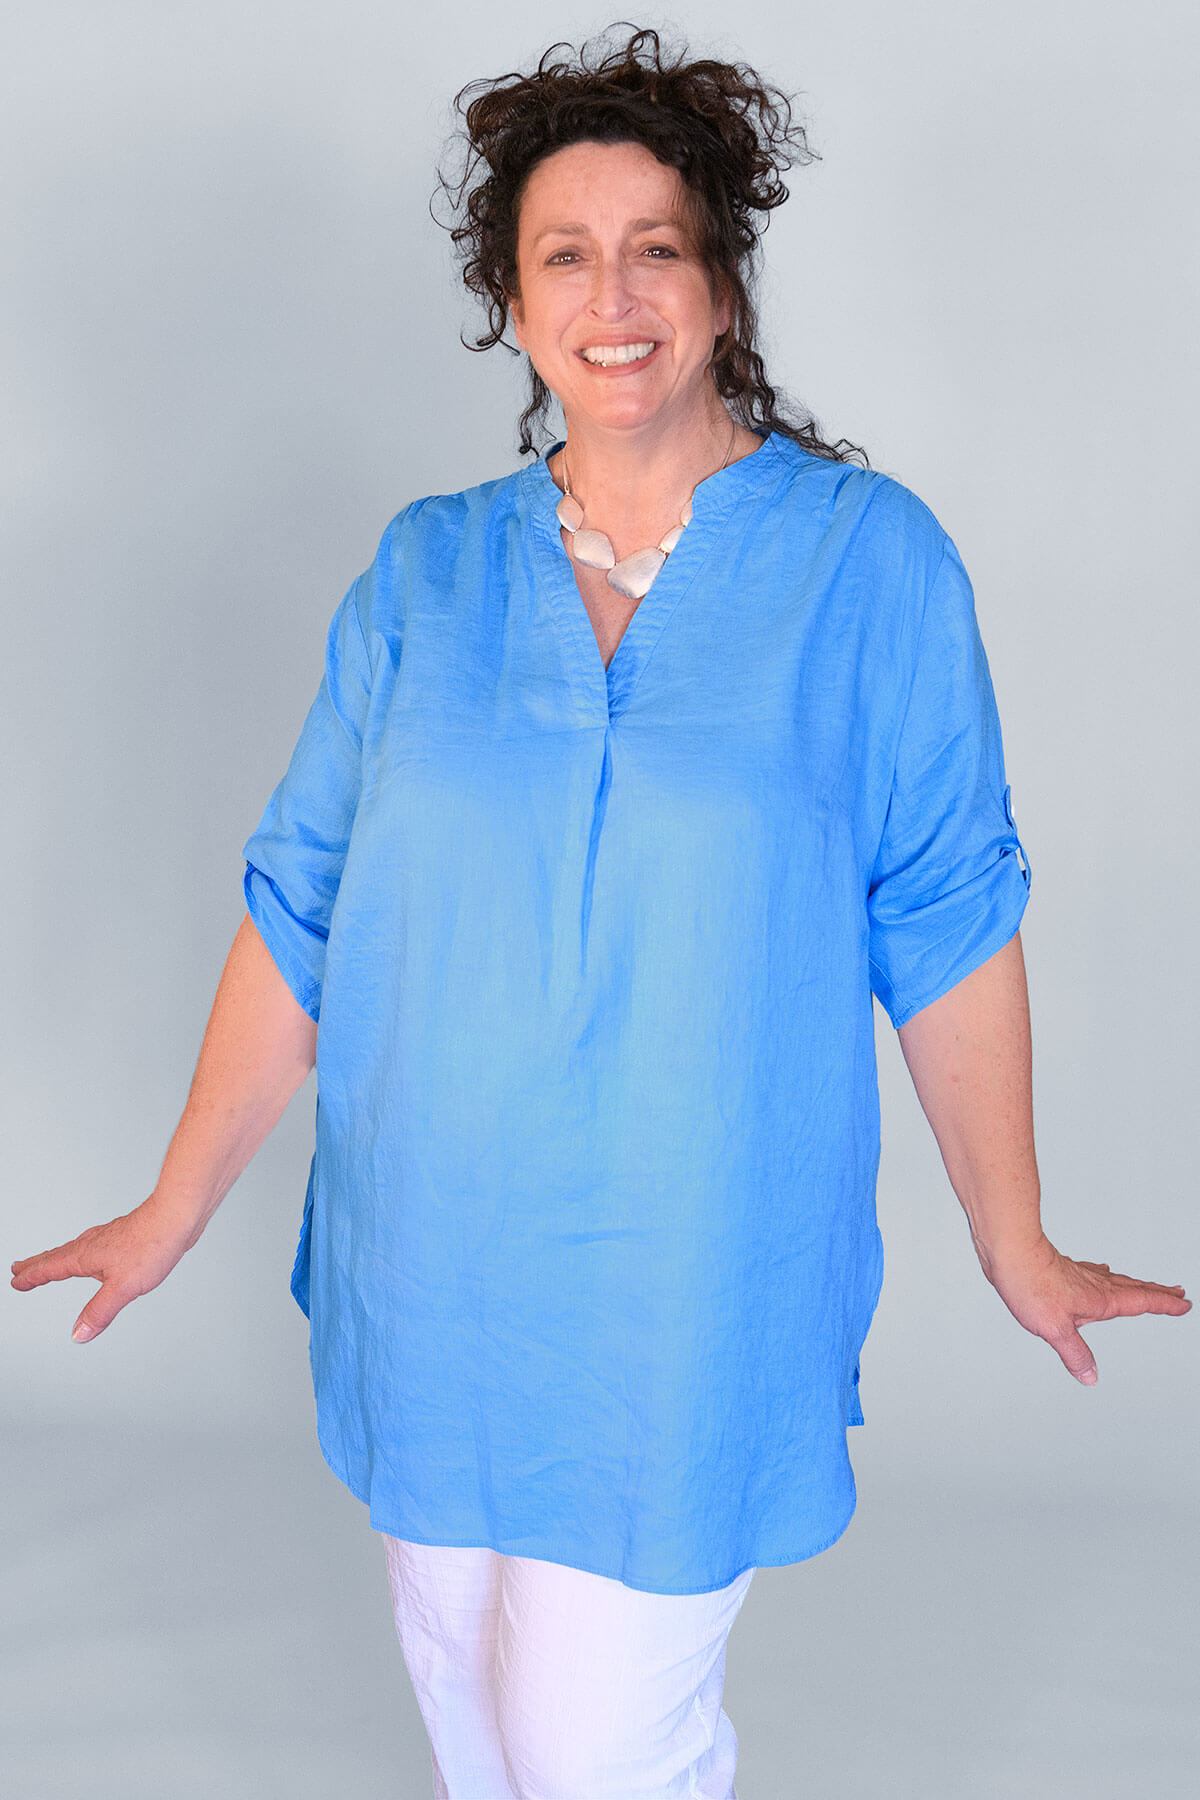 Doris Streich linen tunic